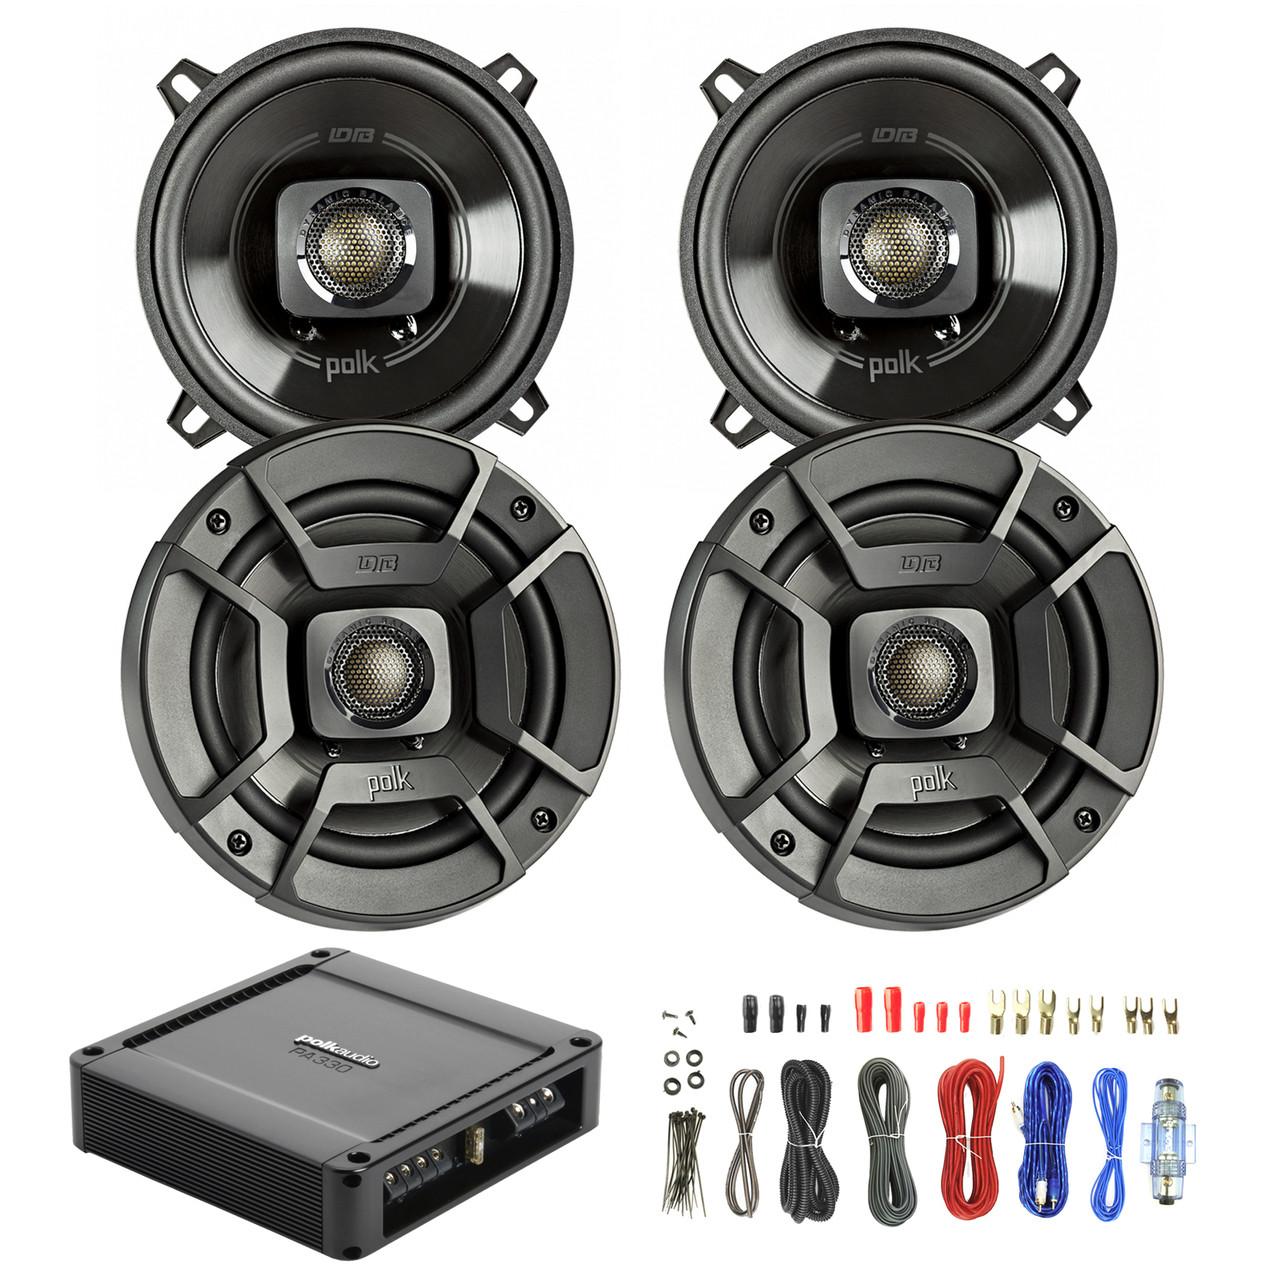 medium resolution of 4x polk audio db522 5 25 inch 300 watt 2 way speakers new